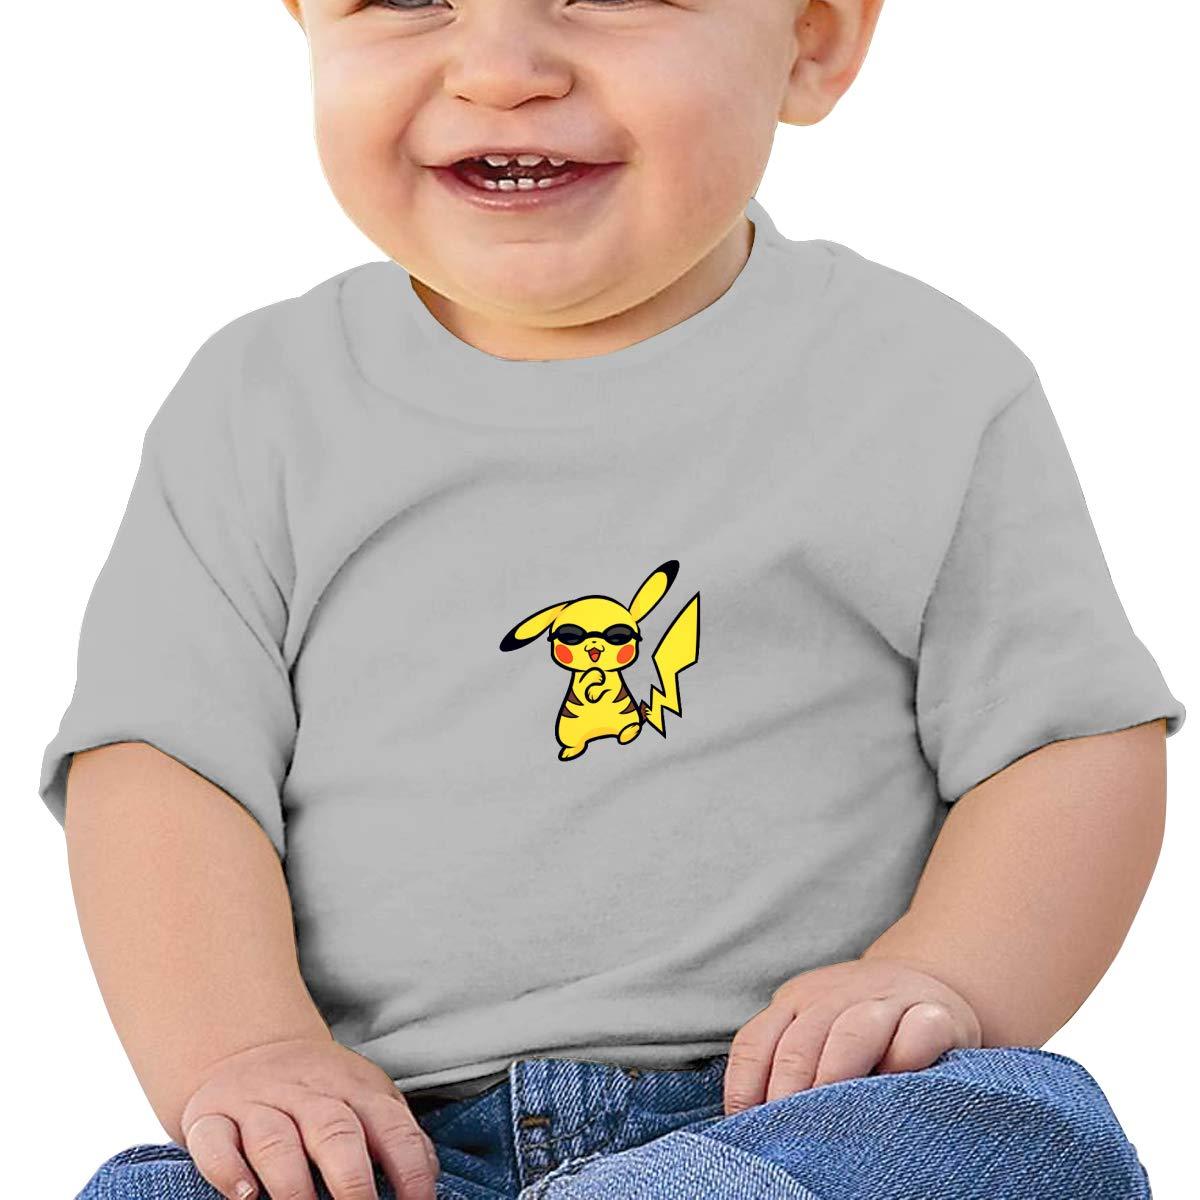 SakanpoAnime Pikachu Toddler//Infant Short Sleeve Cotton T Shirts Gray